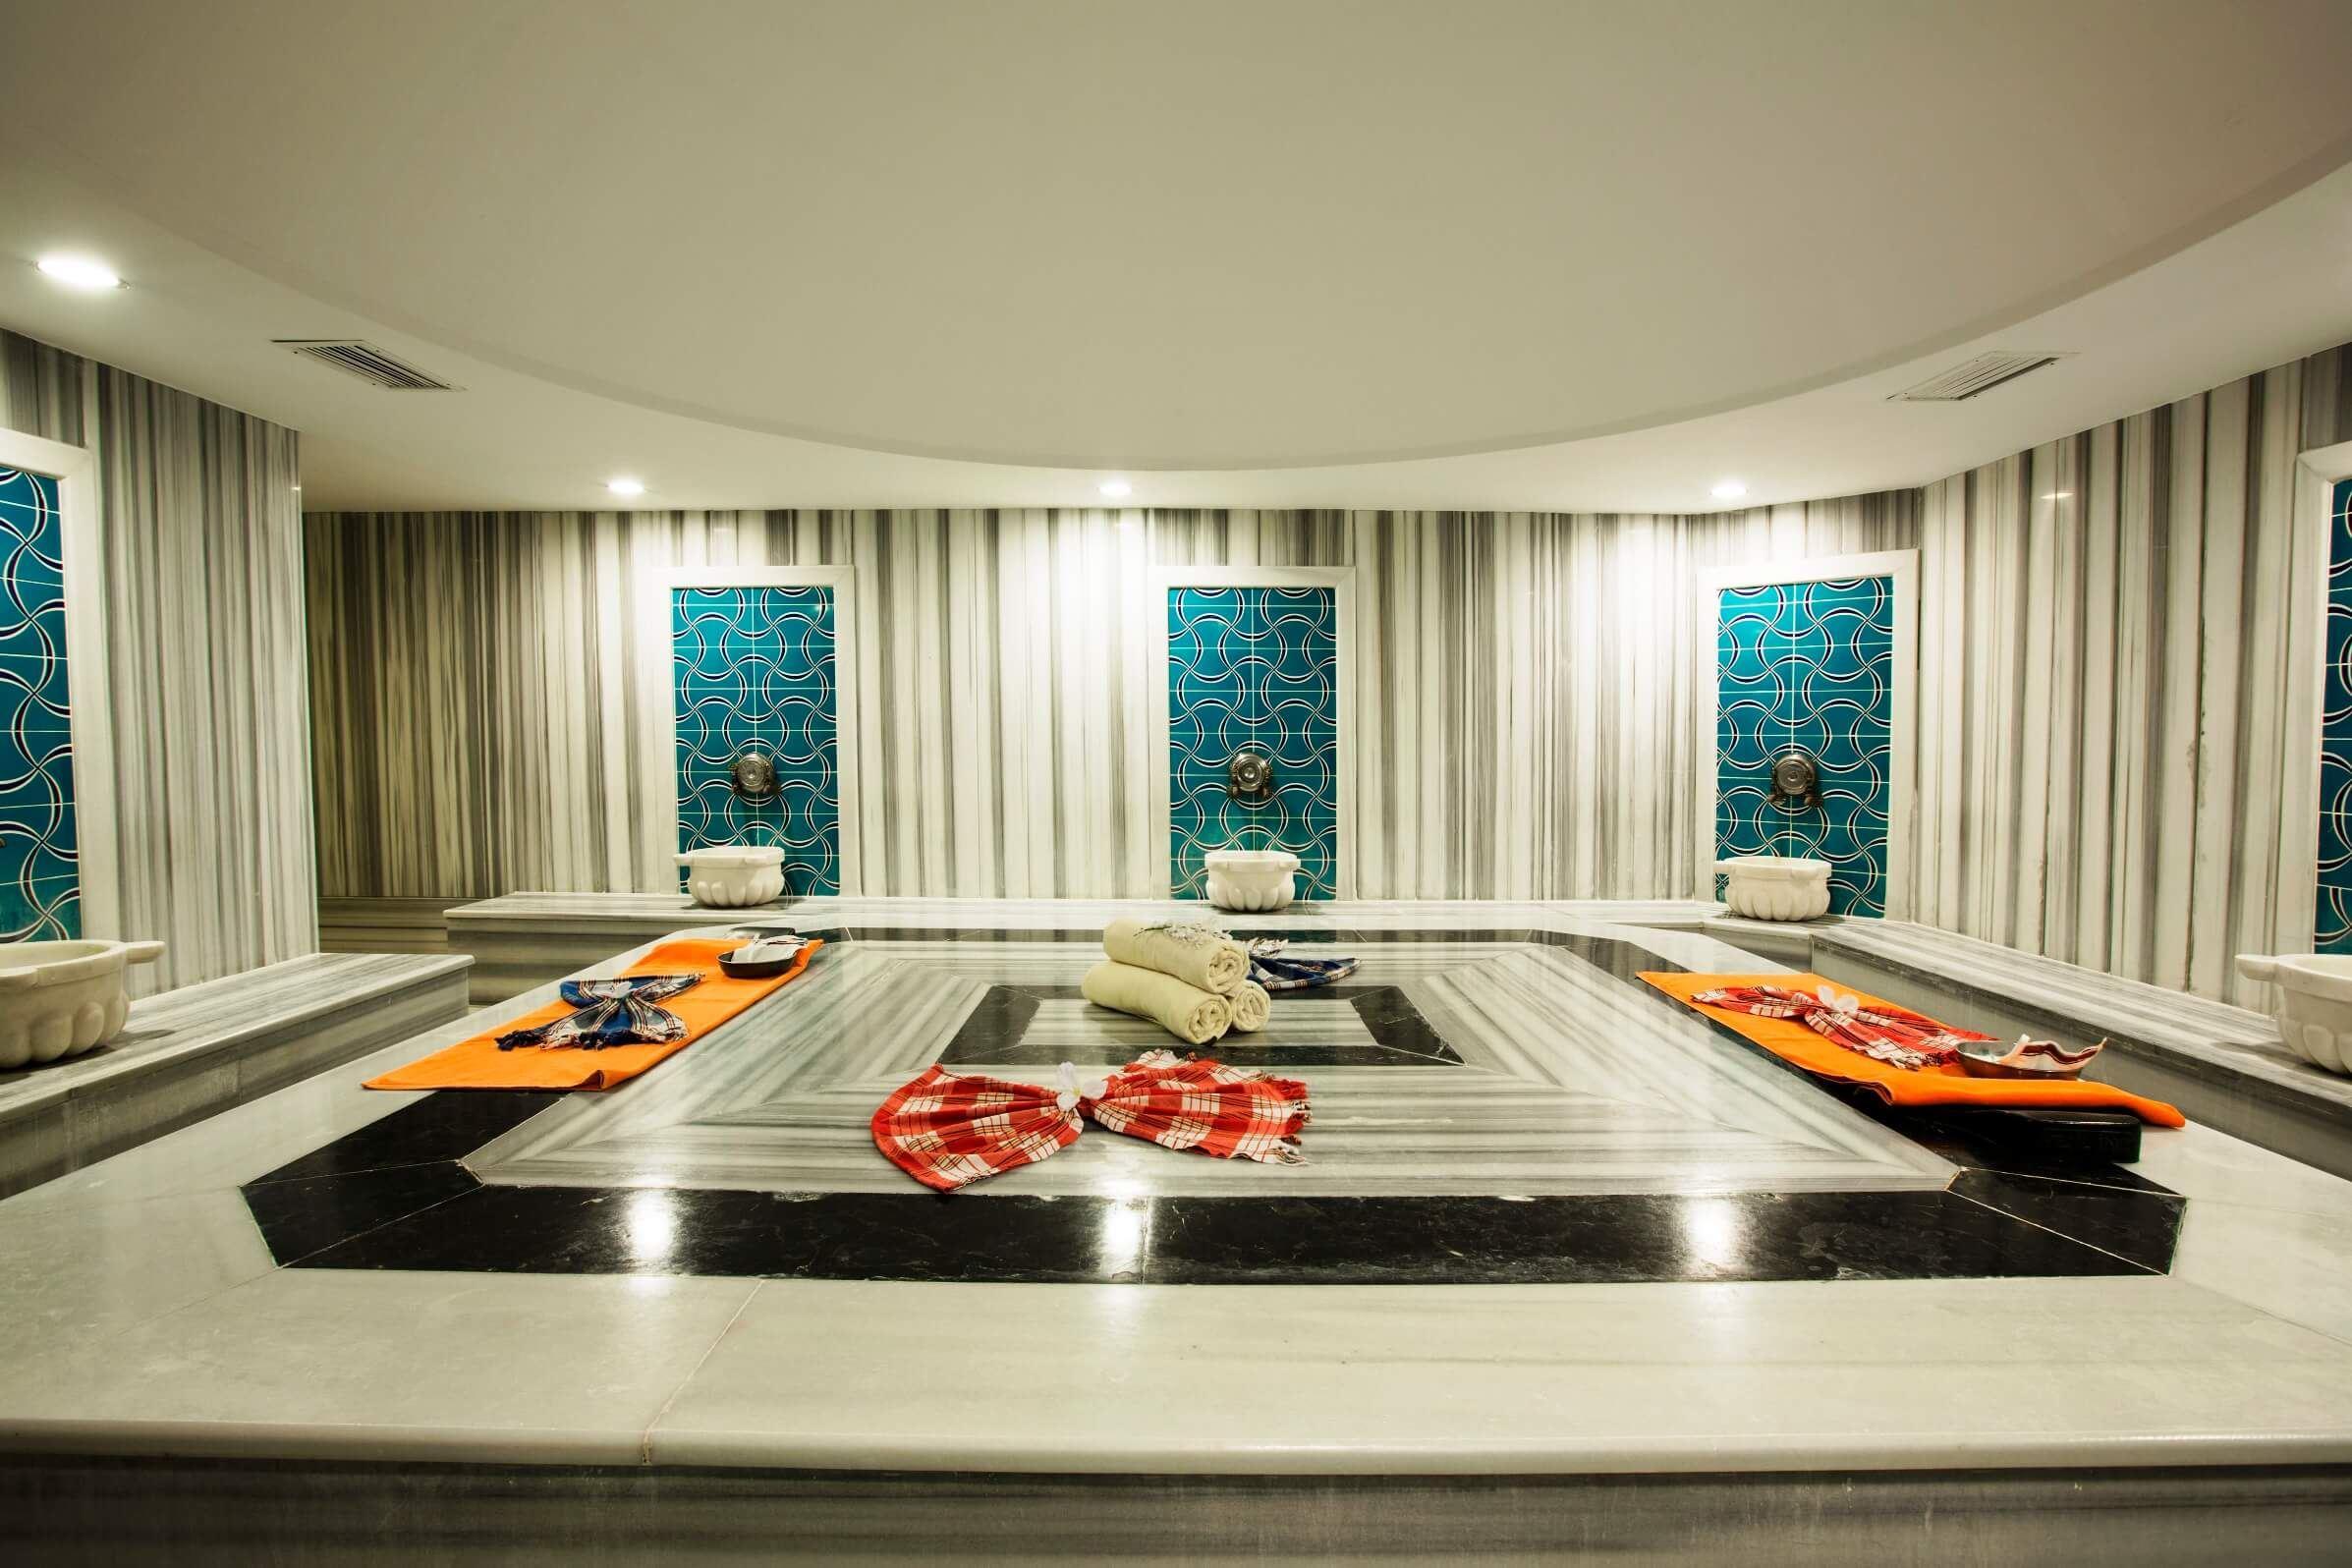 http://www.orextravel.sk/OREX/hotelphotos/ramada-resort-side-general-0011.jpg